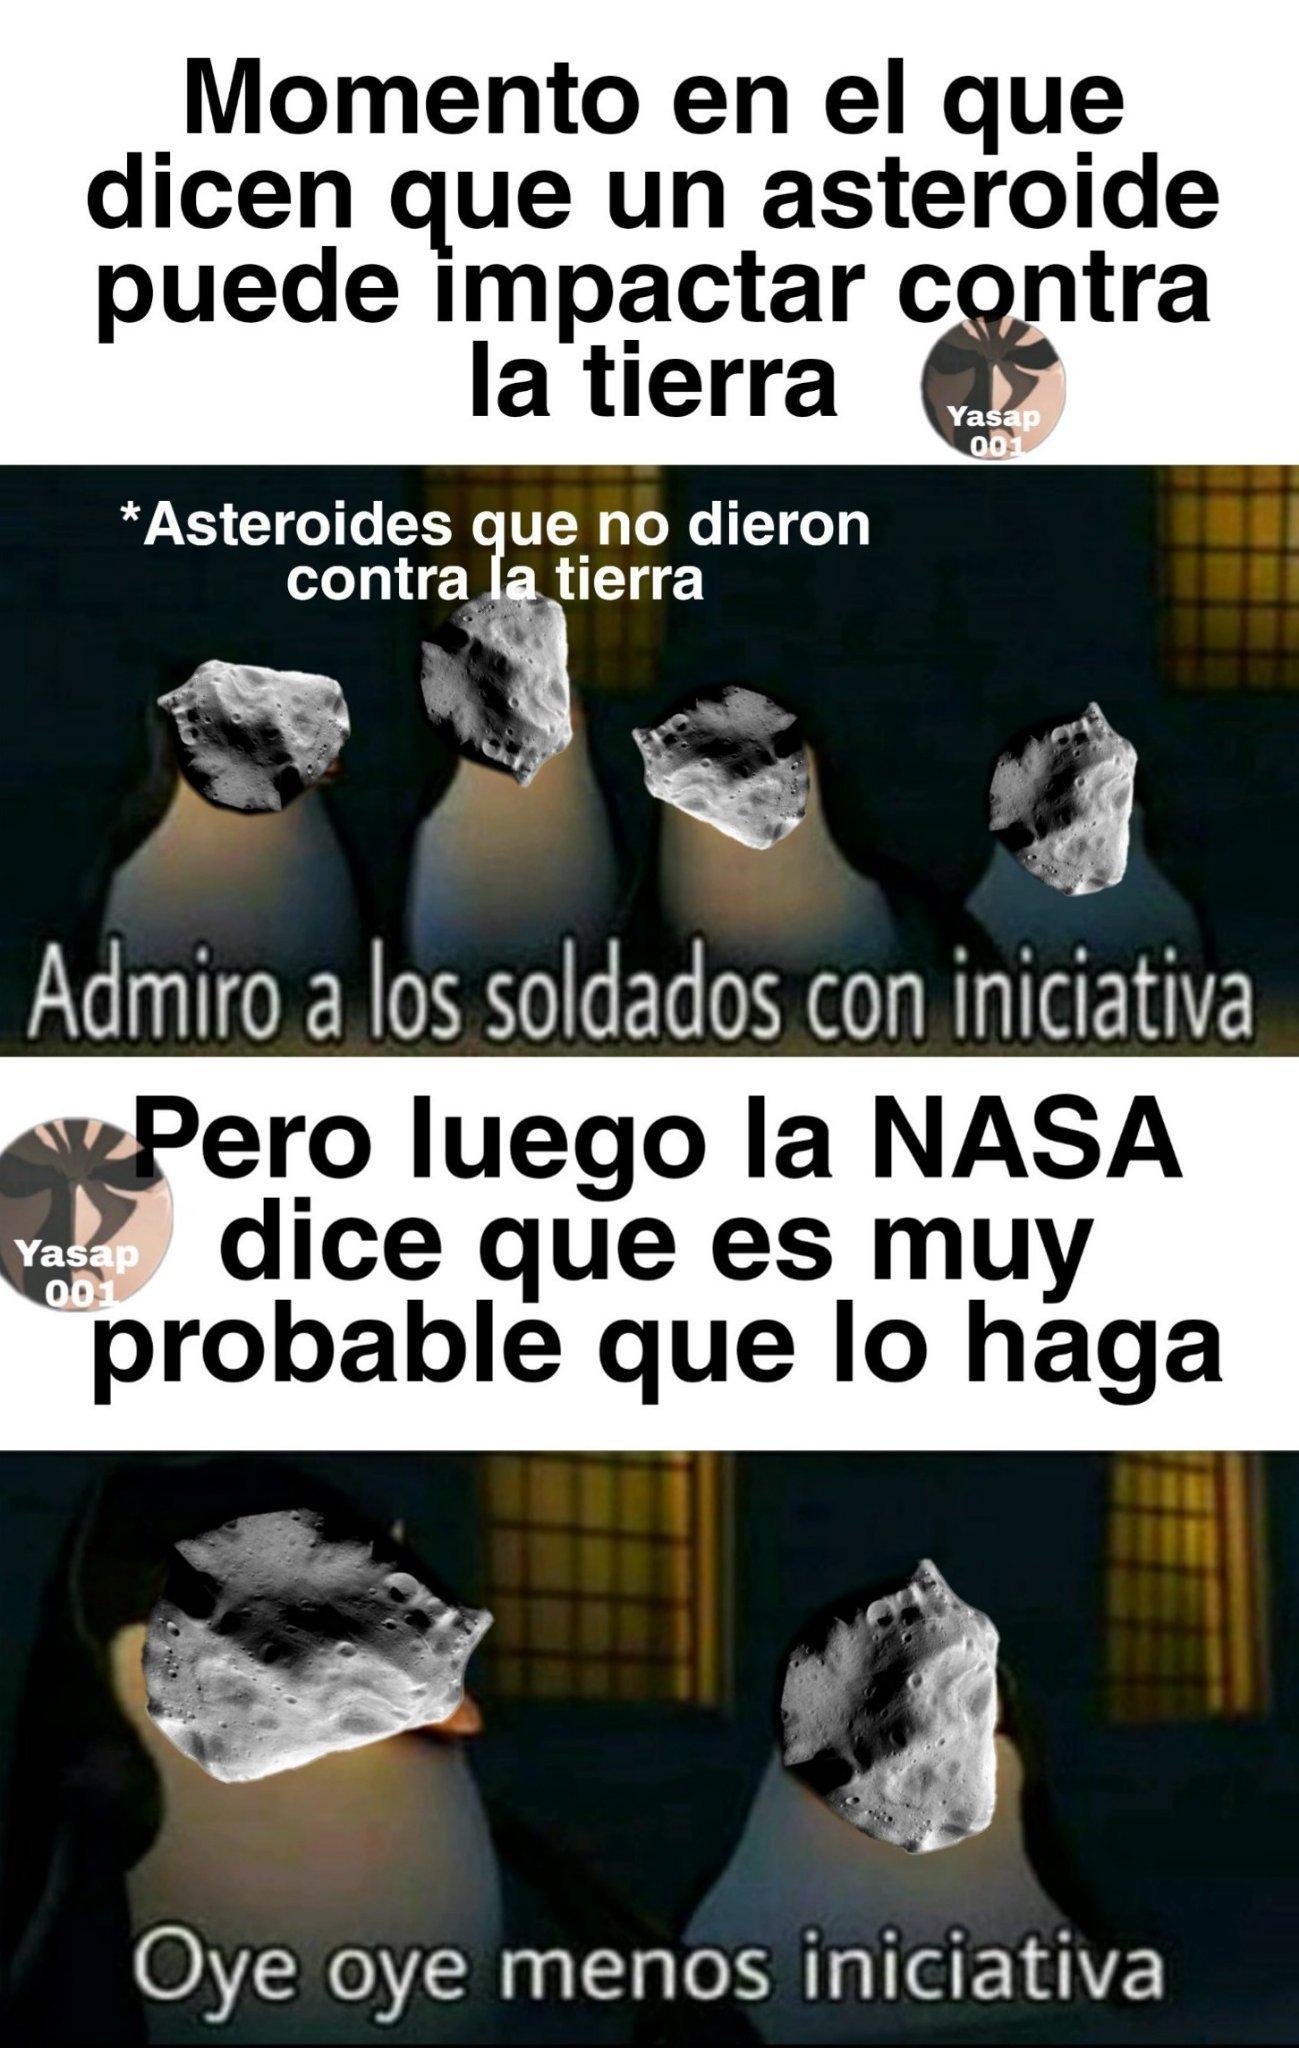 Asteroide voladorrrr... - meme